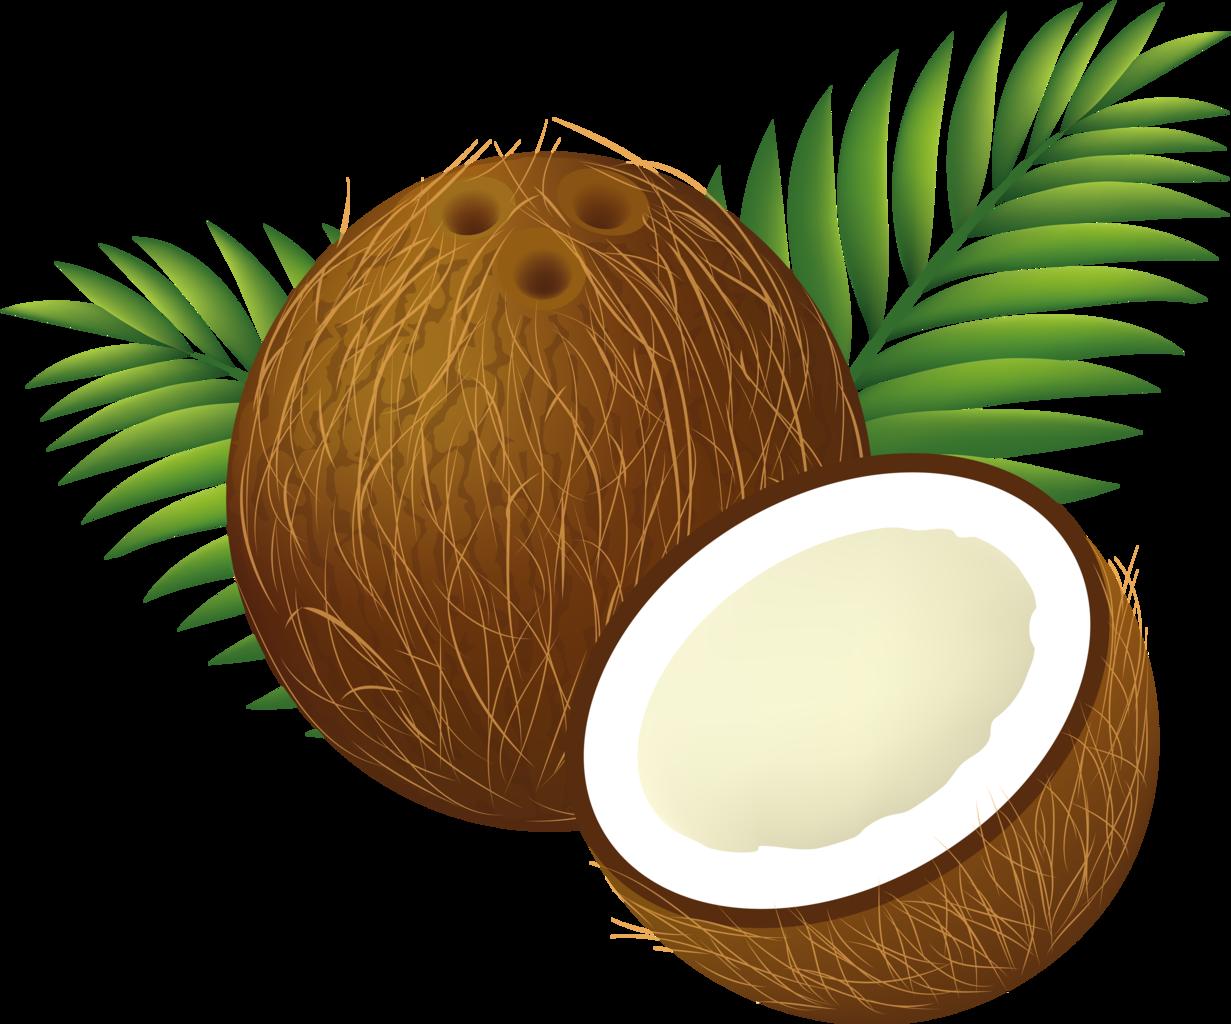 clipart freeuse stock transparent coconut file #105440742